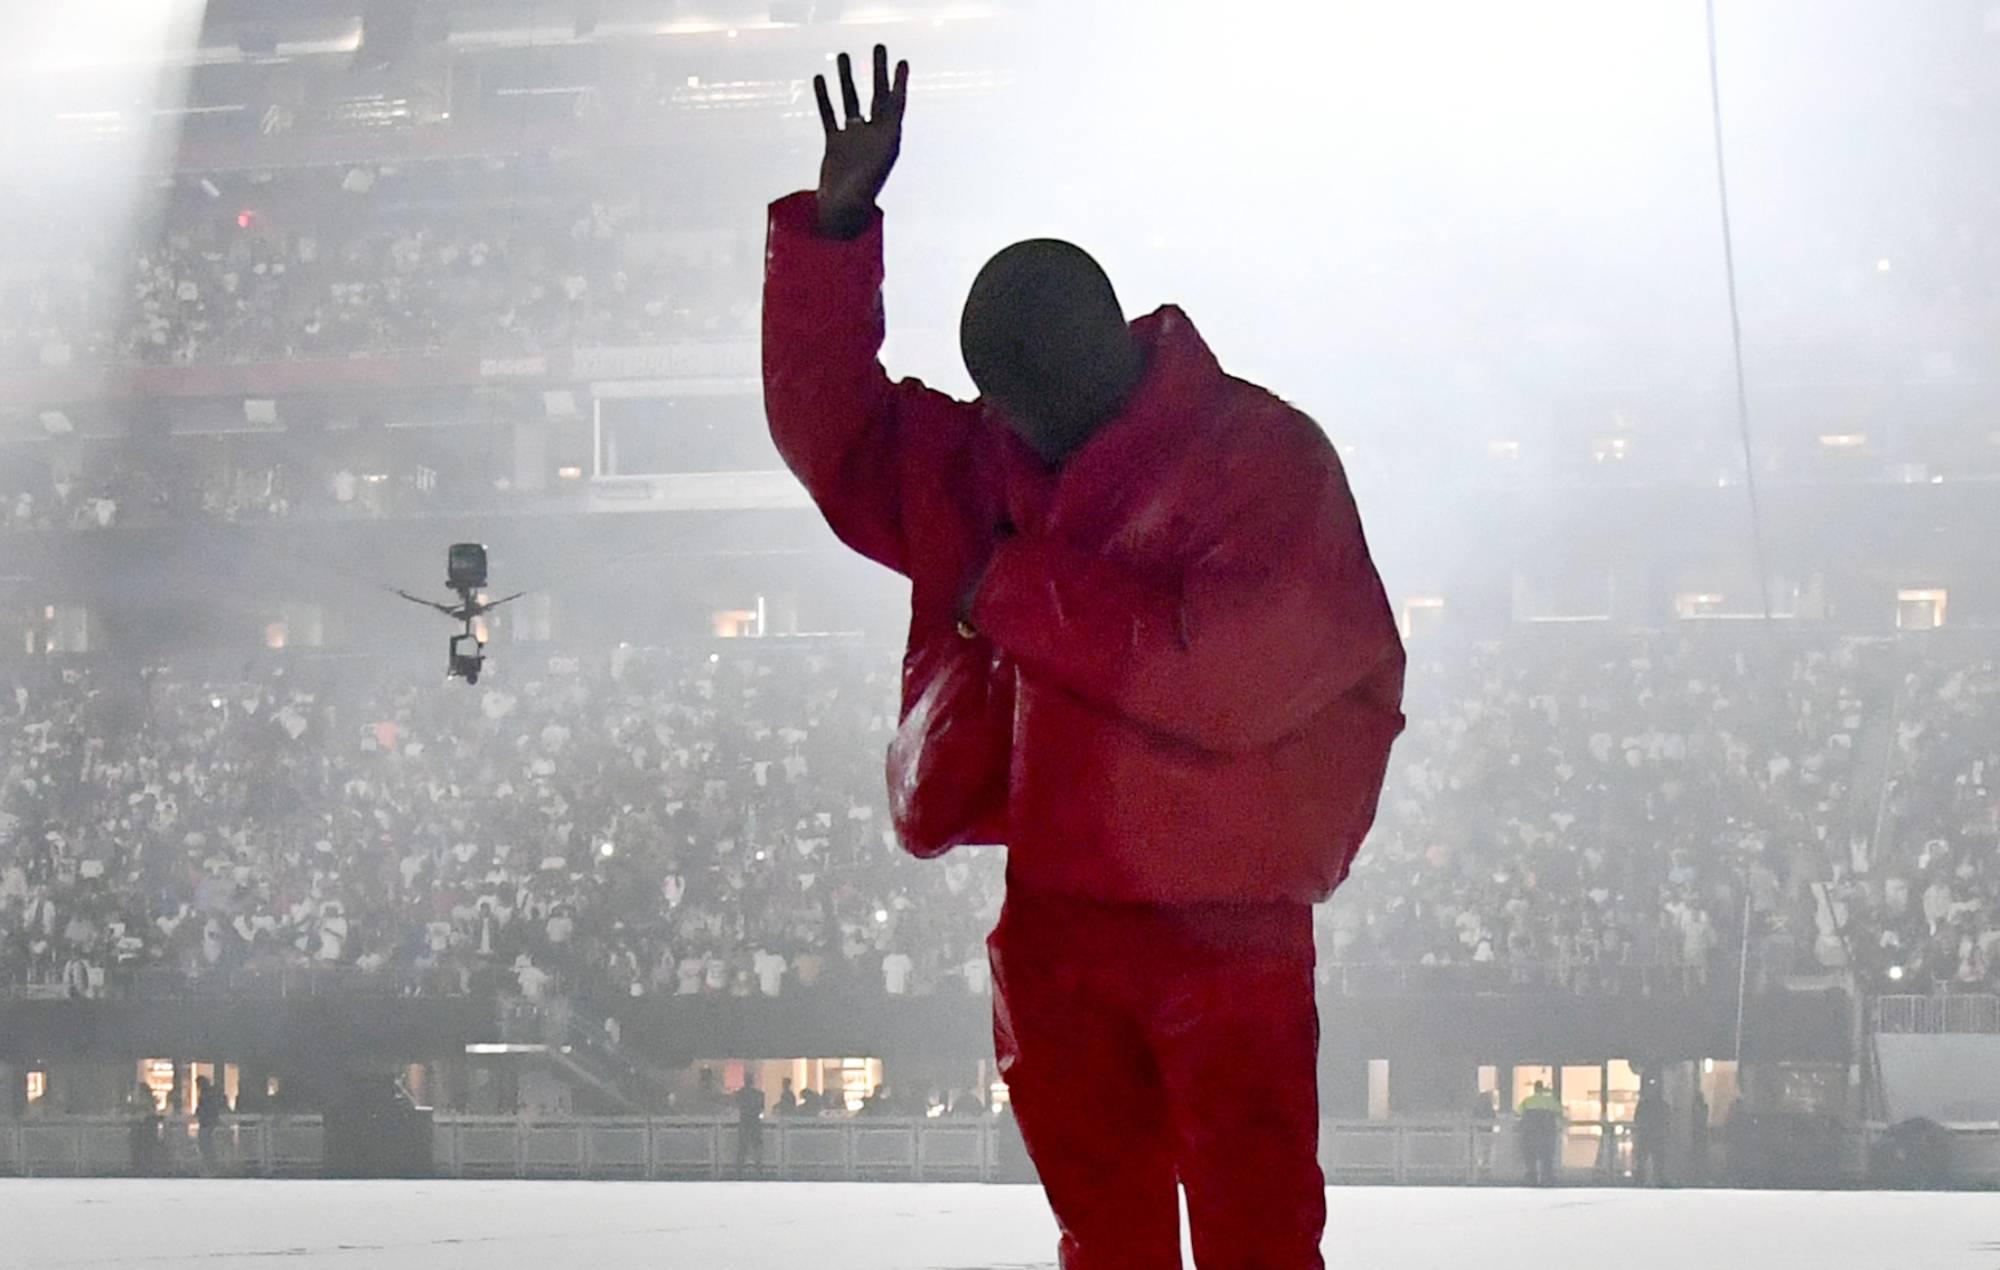 Watch Kanye West perform 'Runaway' and 'Flashing Lights' at Italian wedding